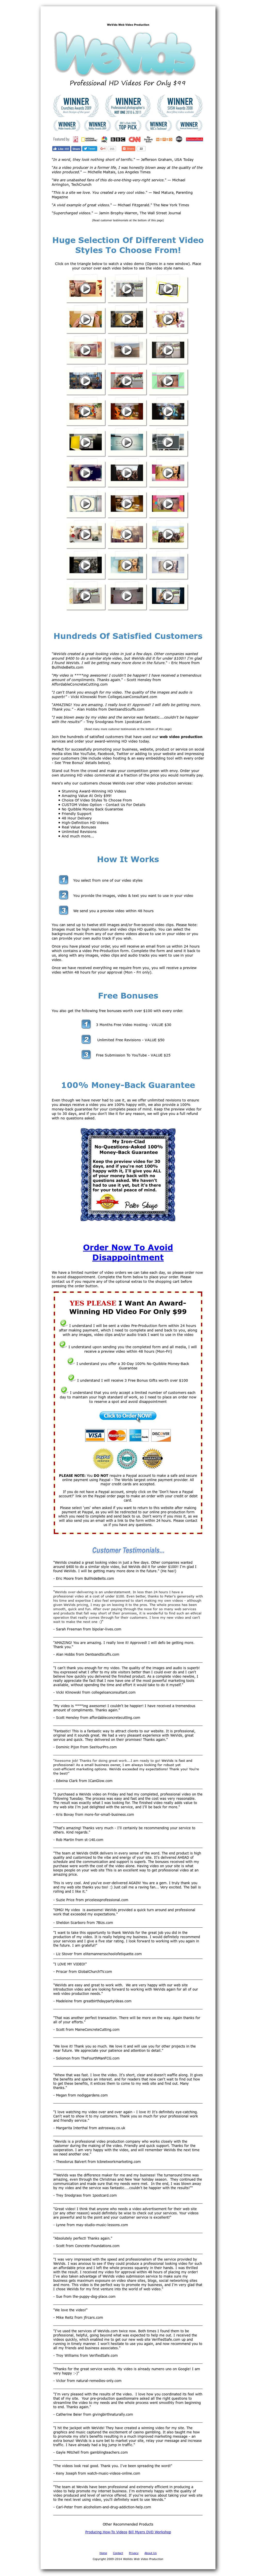 Wevids Web Video Production Competitors, Revenue and